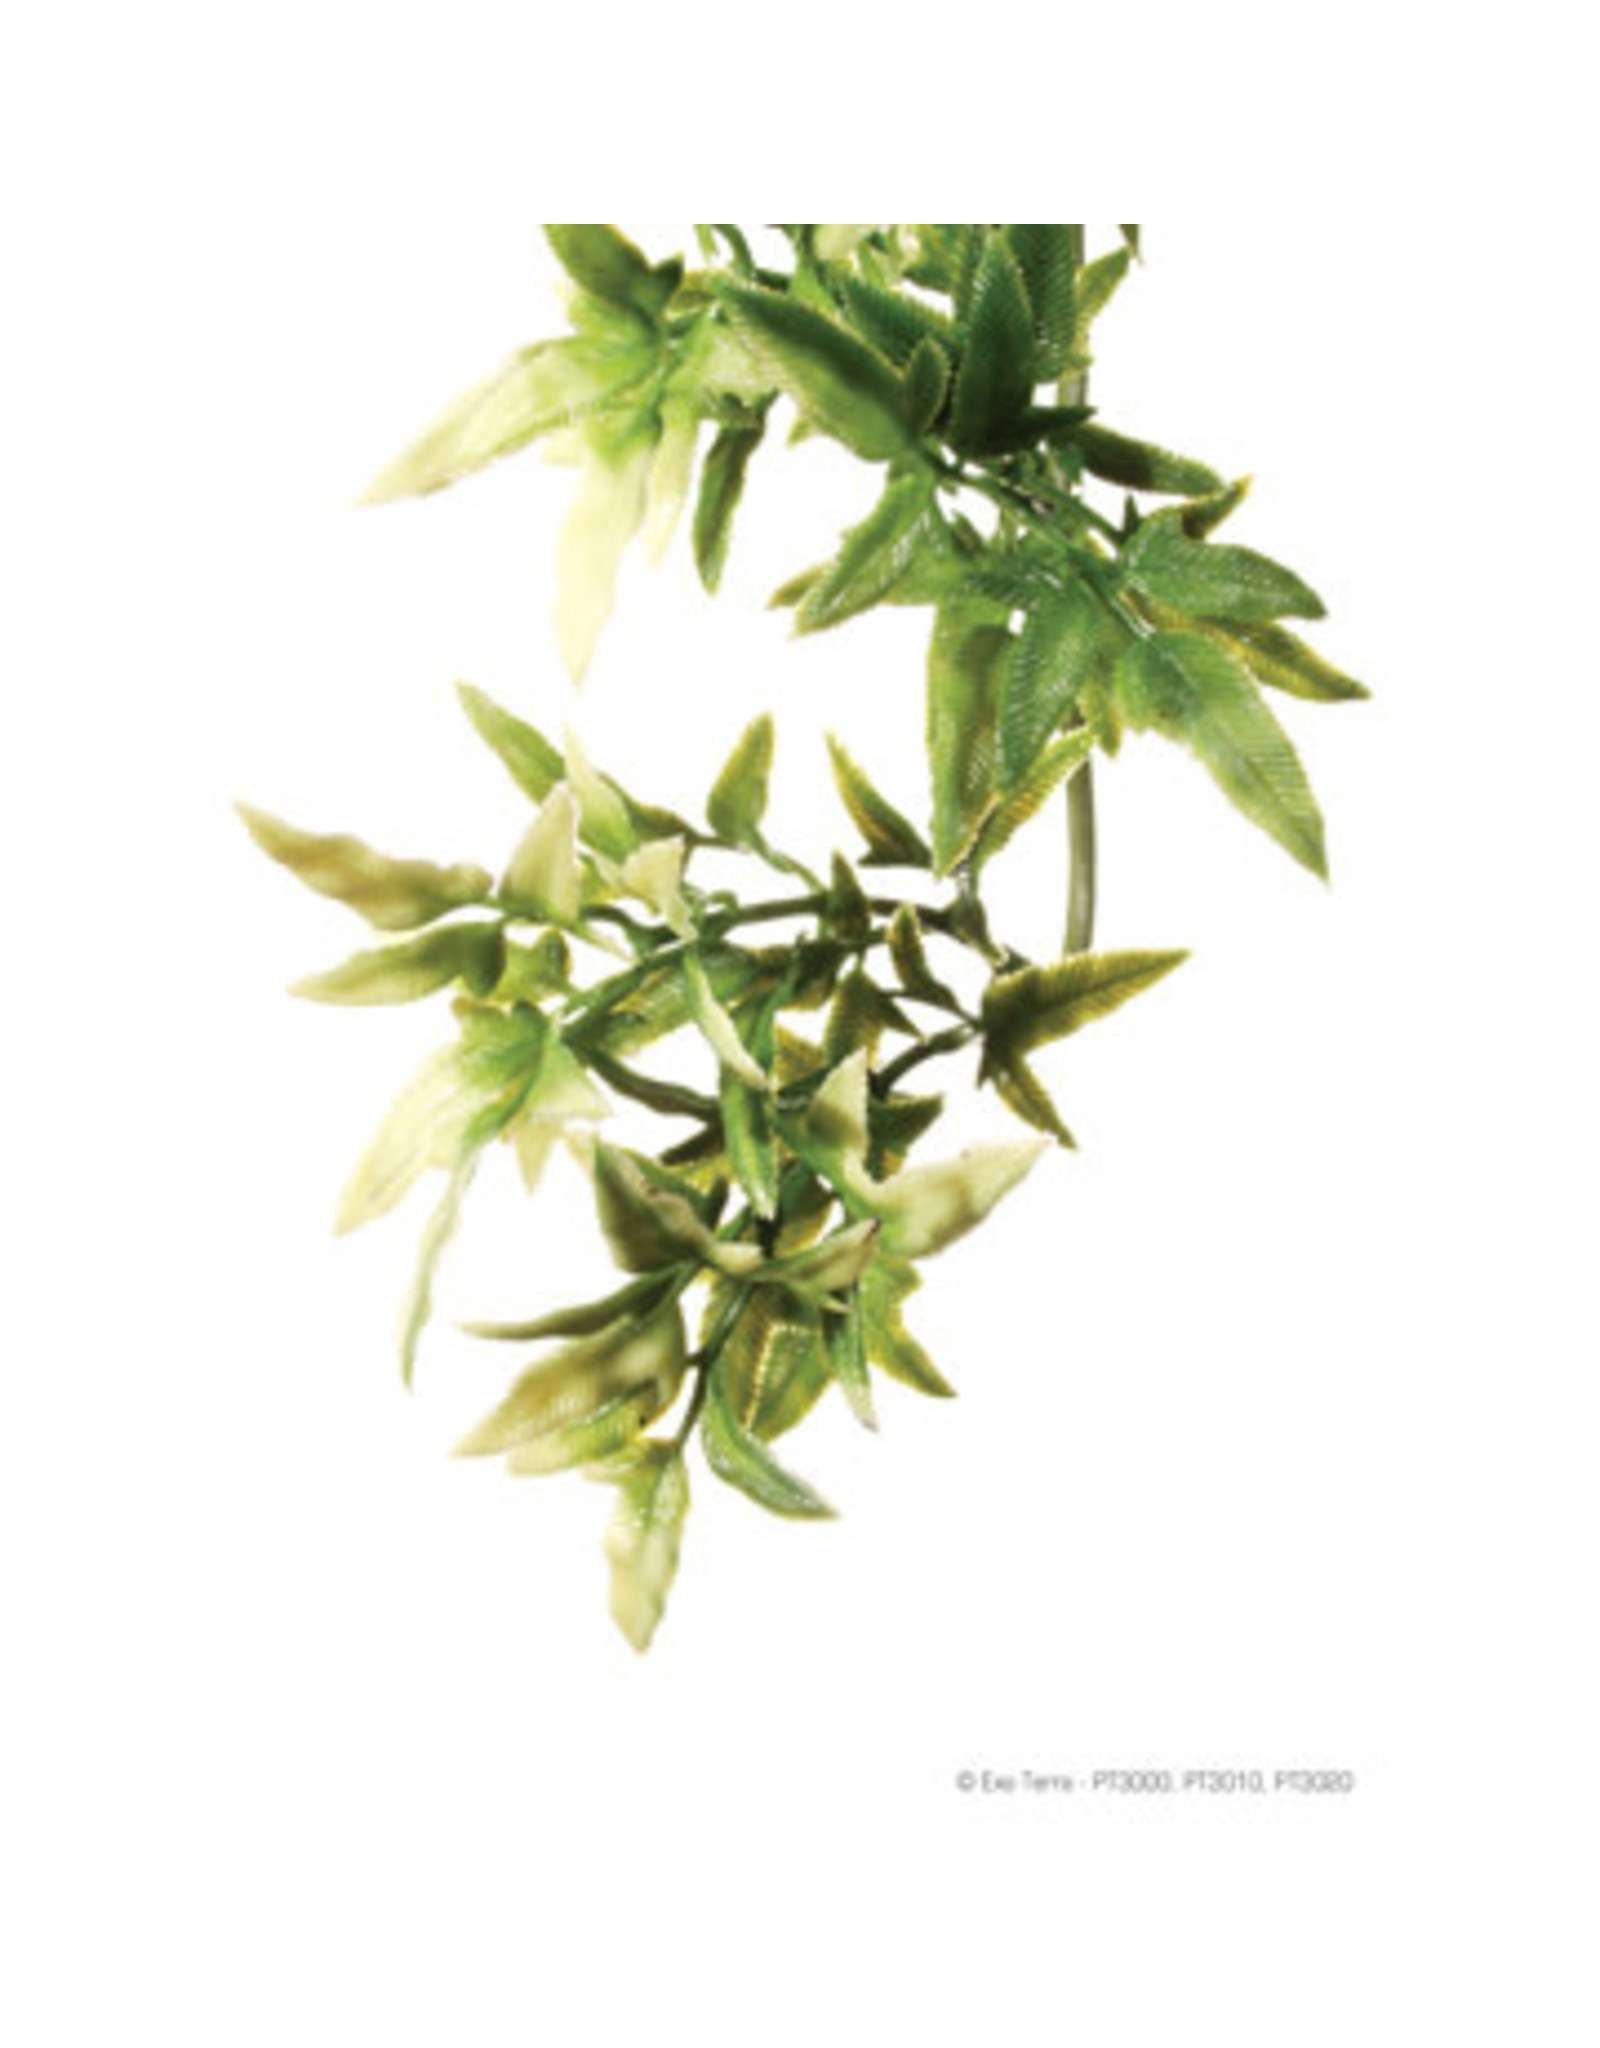 Exo Terra Jungle Plant Croton Large